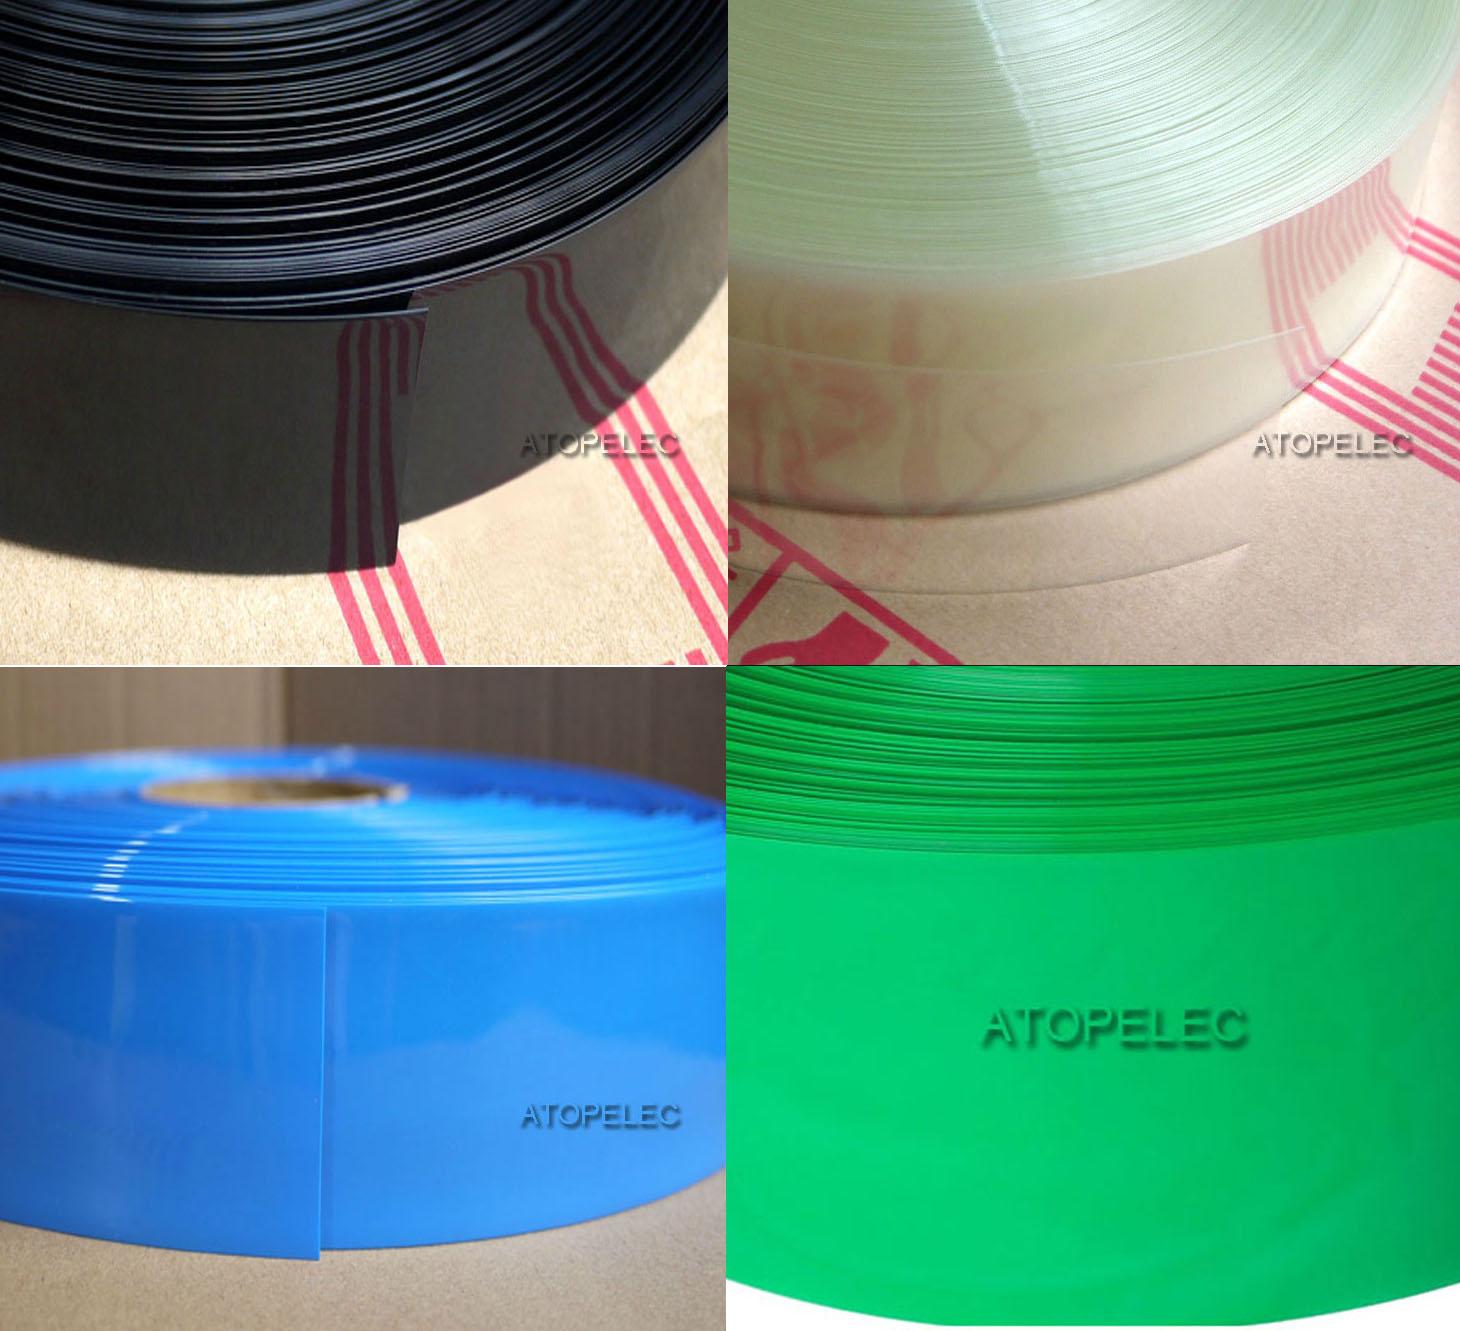 5M PVC Heat Shrink Tubing Envoltório Largura 110mm/115mm/120mm/125mm/130mm/140mm/150mm/160mm/170mm/180mm/190mm preto/vermelho/azul/branco/claro